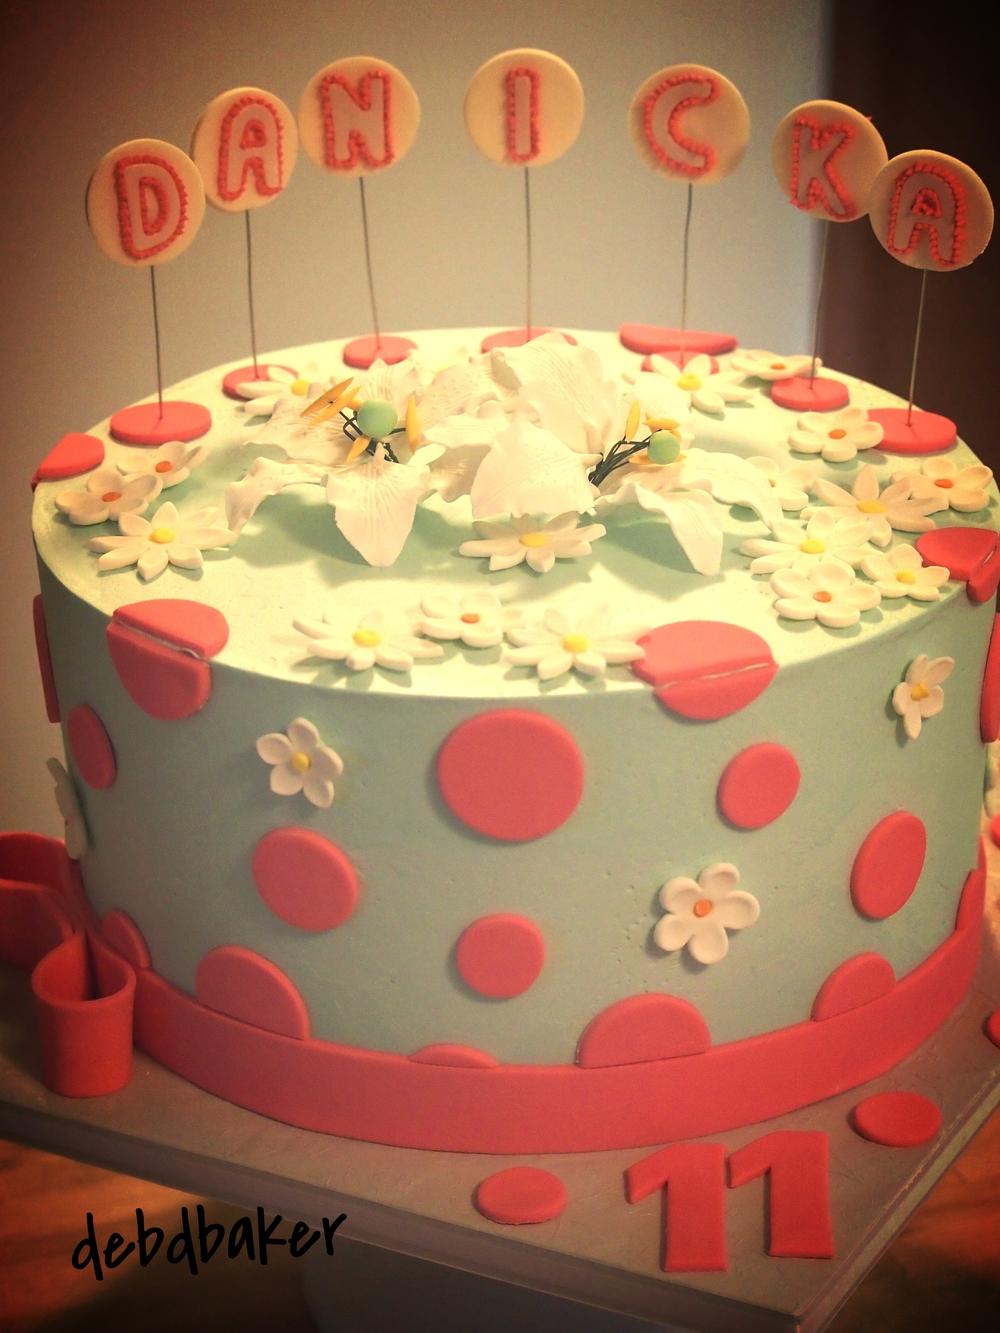 Danicka's 11th Birthday Cake